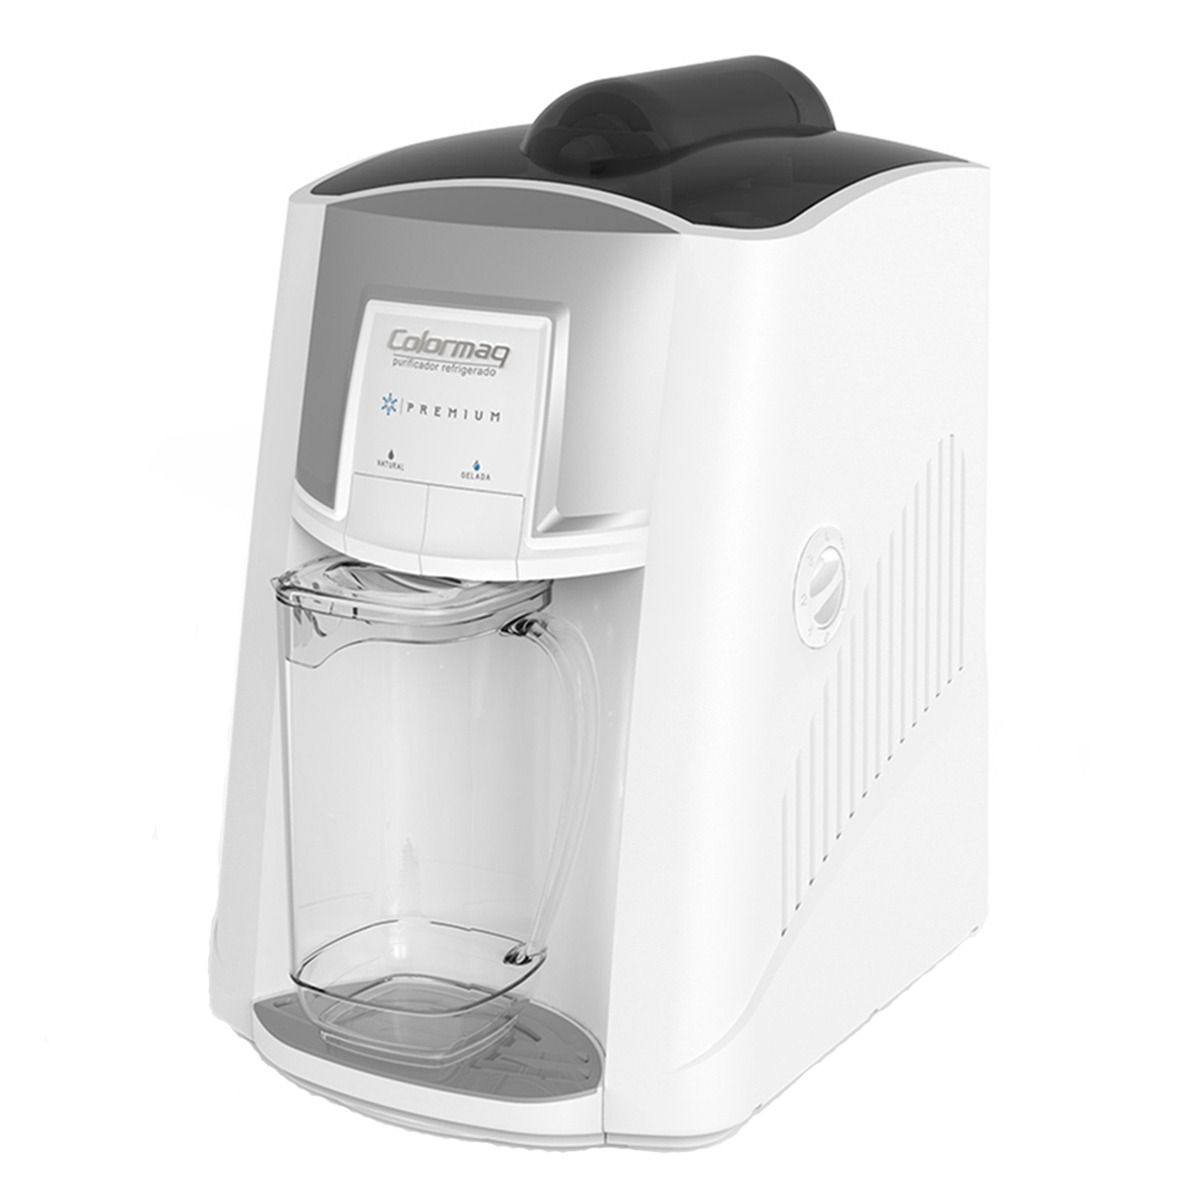 Purificador de Água Gelada Colormaq Premium Branco Compressor + Refil extra